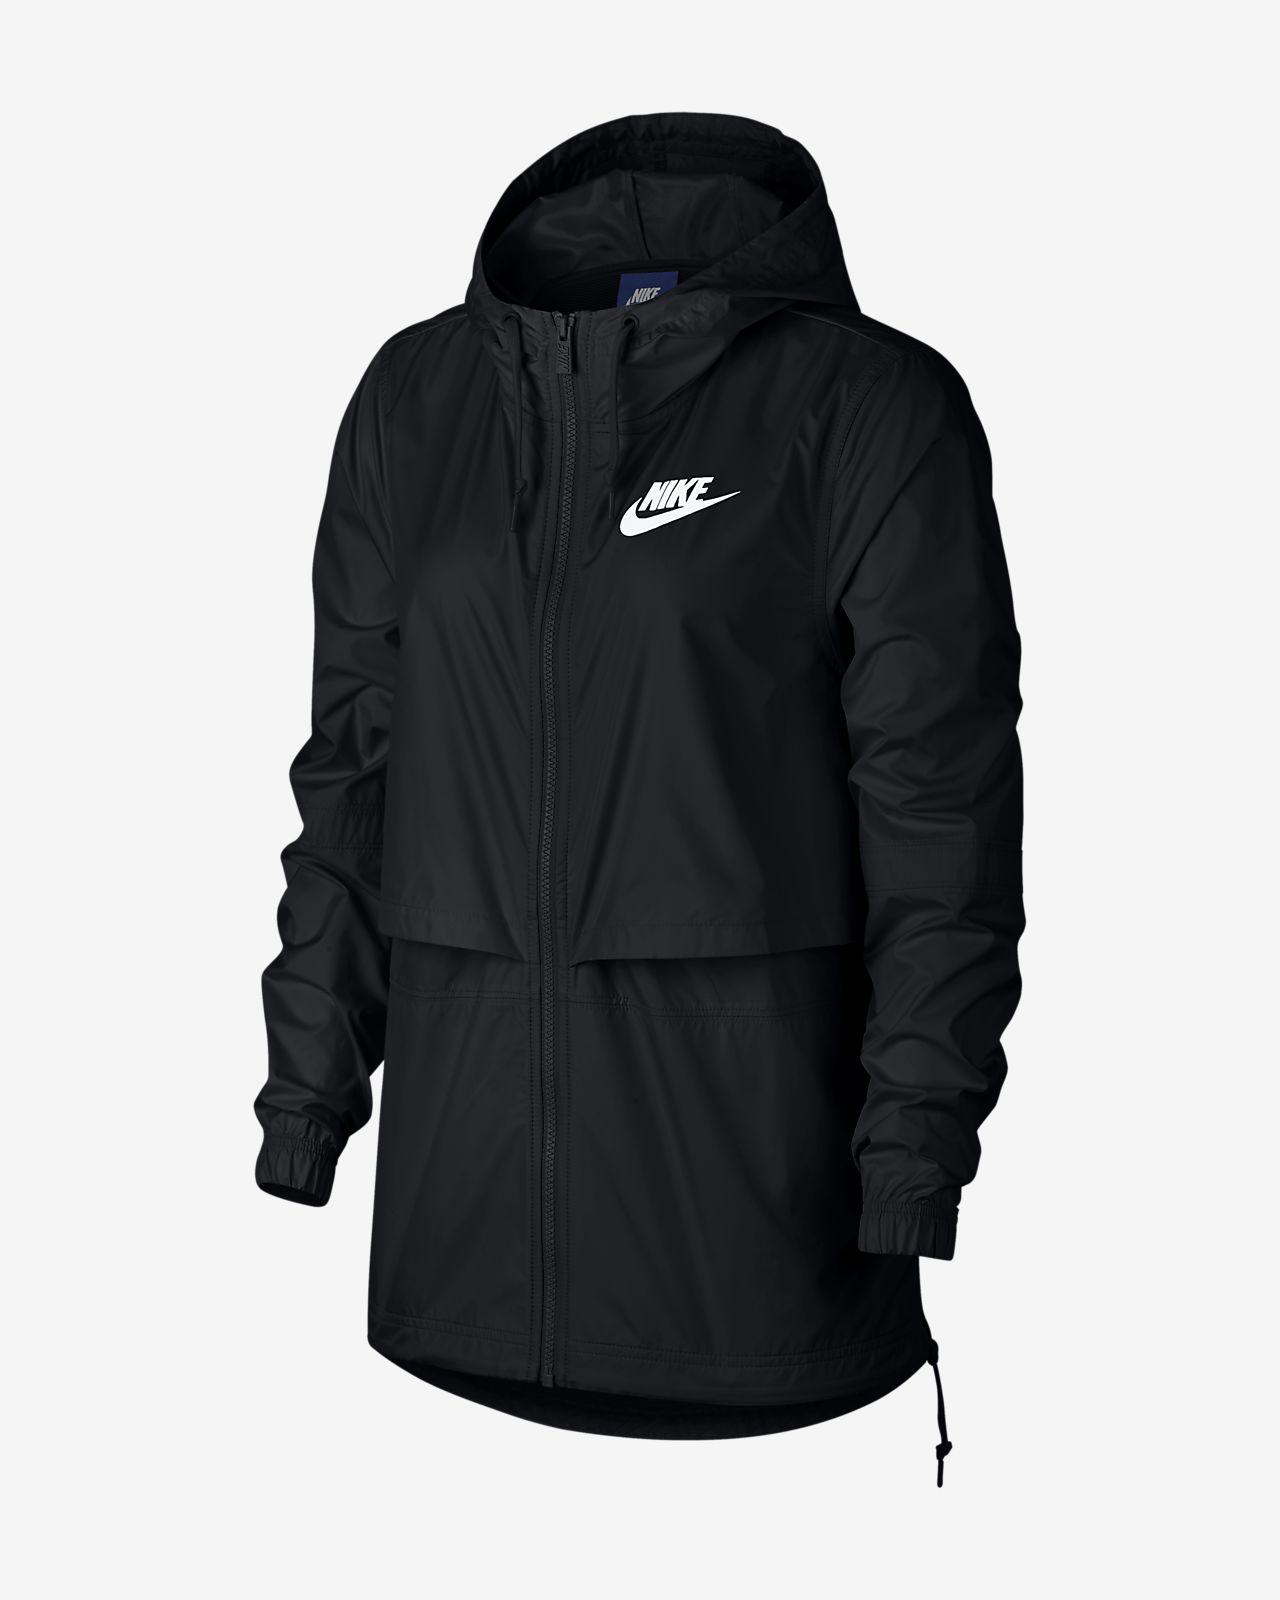 Veste tissée Nike Sportswear pour Femme.